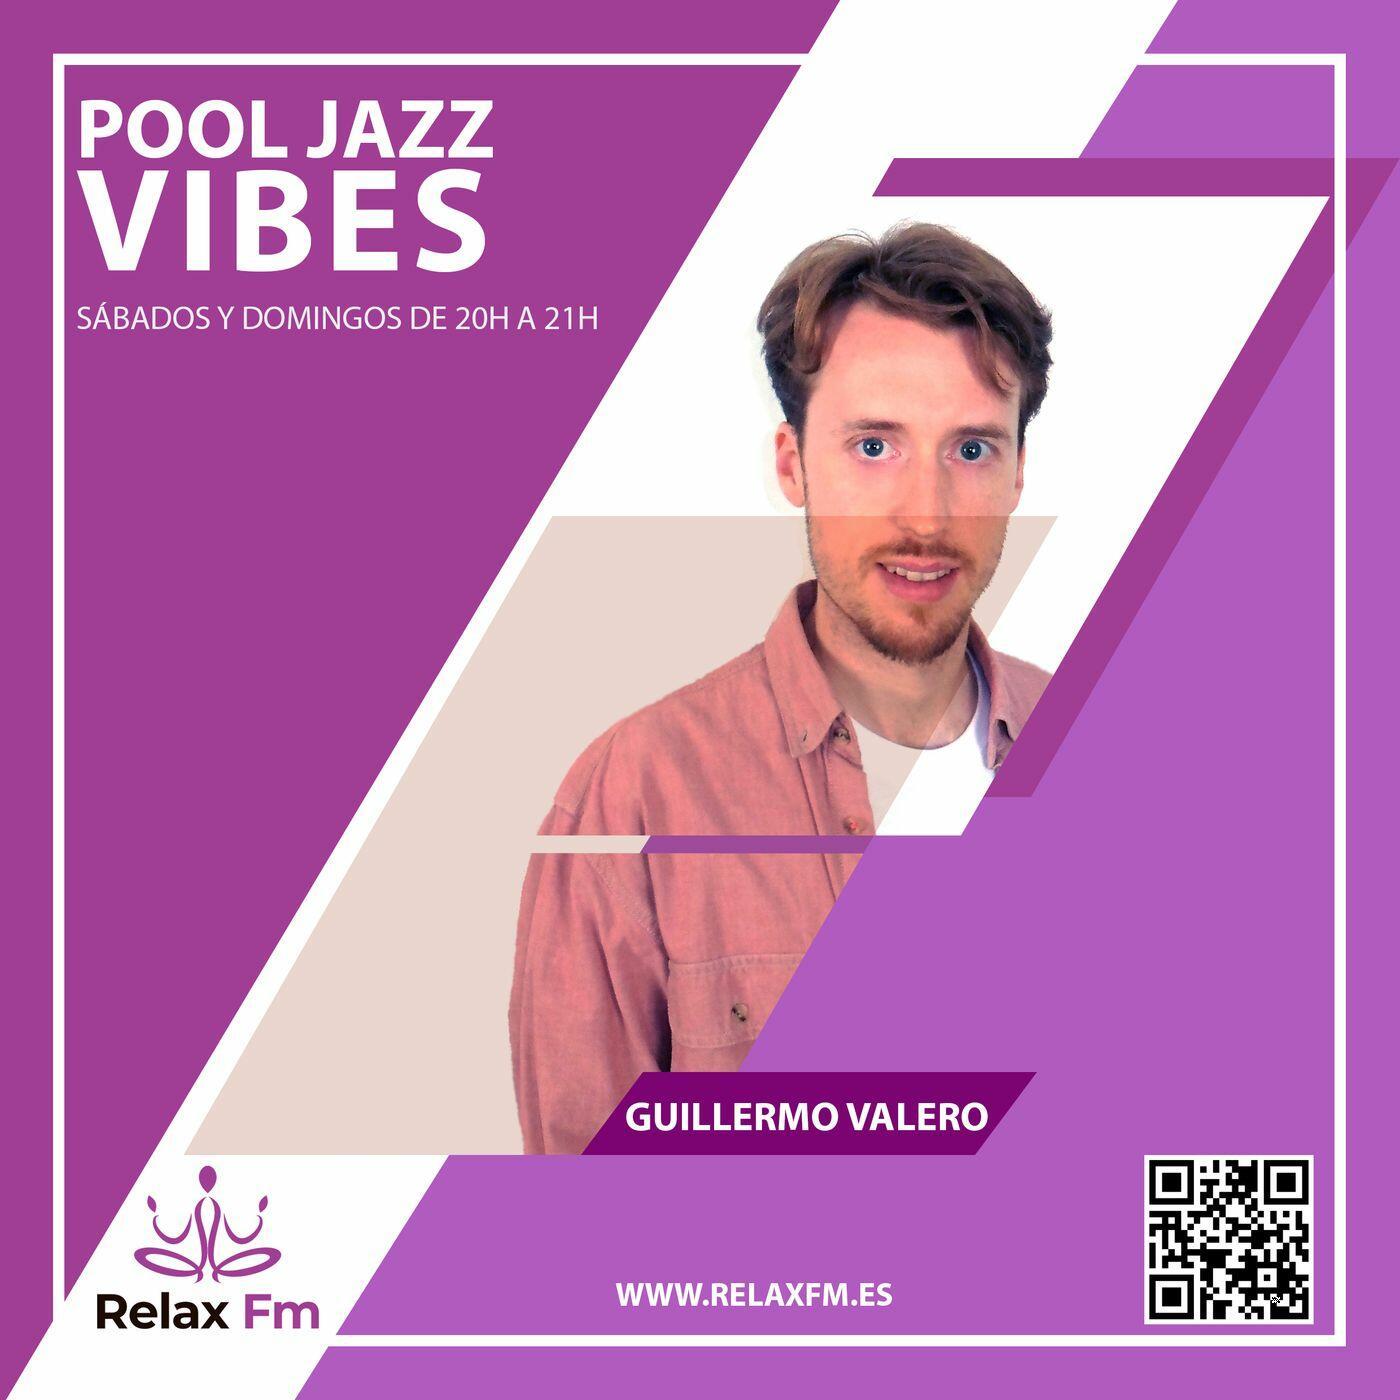 Pool Jazz Vibes